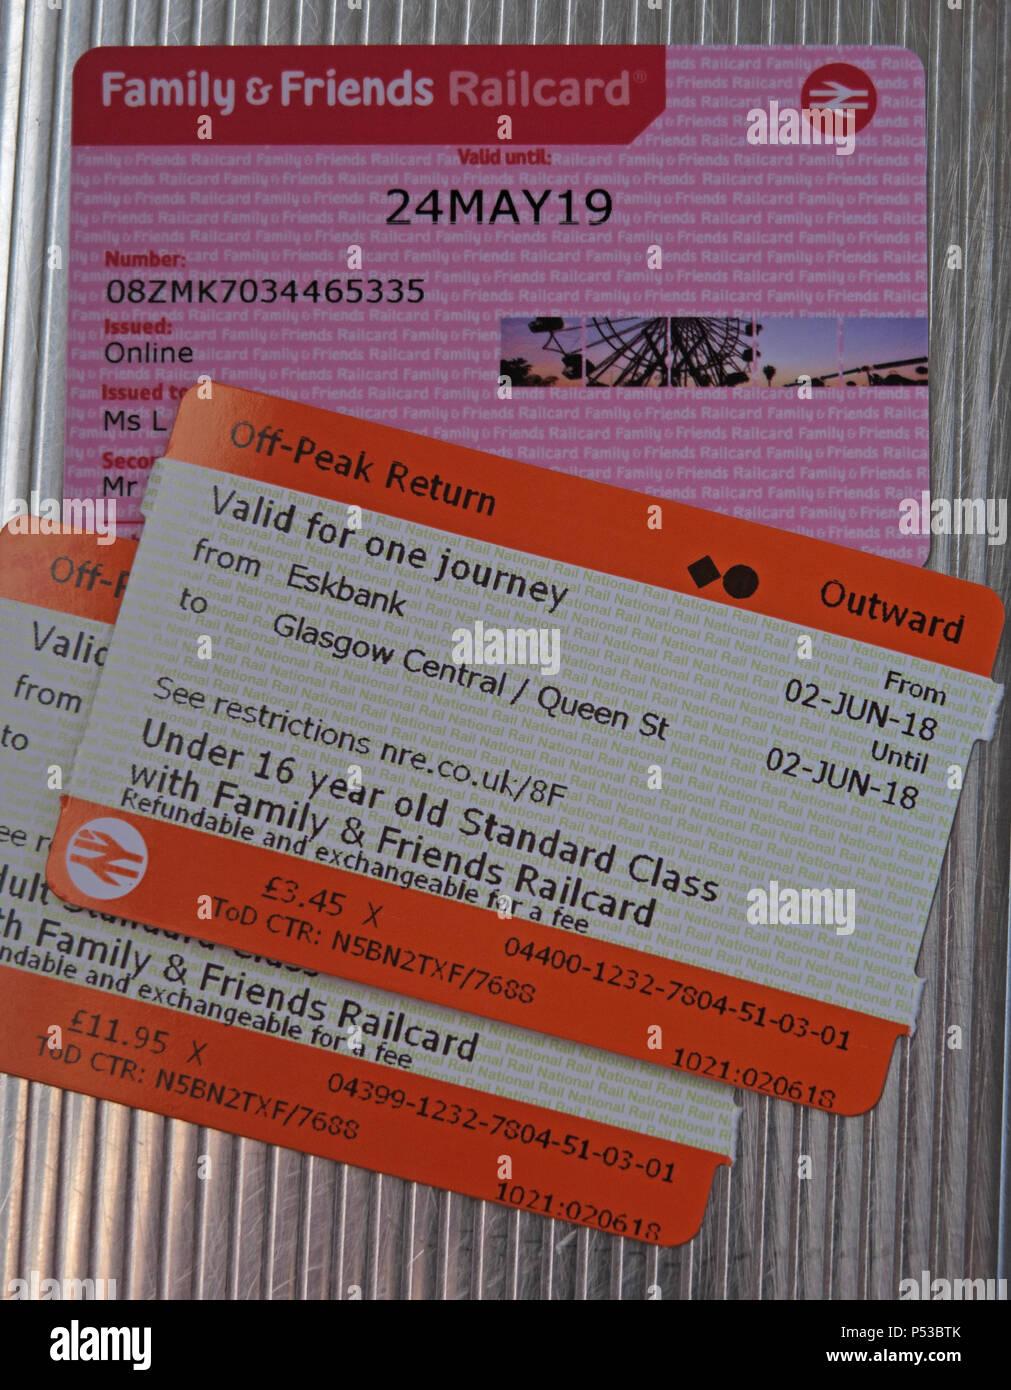 GoTonySmith,@HotpixUK,station,stations,Eskbank,Midlothian,Scotland,UK,Scot Rail,British Rail,BR,TOC,discount,discount train ticket,discount rail ticket,card,cards,railcards,annual rail travel,discount card,rail travel,Great Britain,adults travelling with a child,rail card,railcard,adult-and-child groups,adult-and-child,groups,group,online,standard class,CHFAM,FAM,orange tickets,red stripe,ATOC,cheap,rail,travel,transport